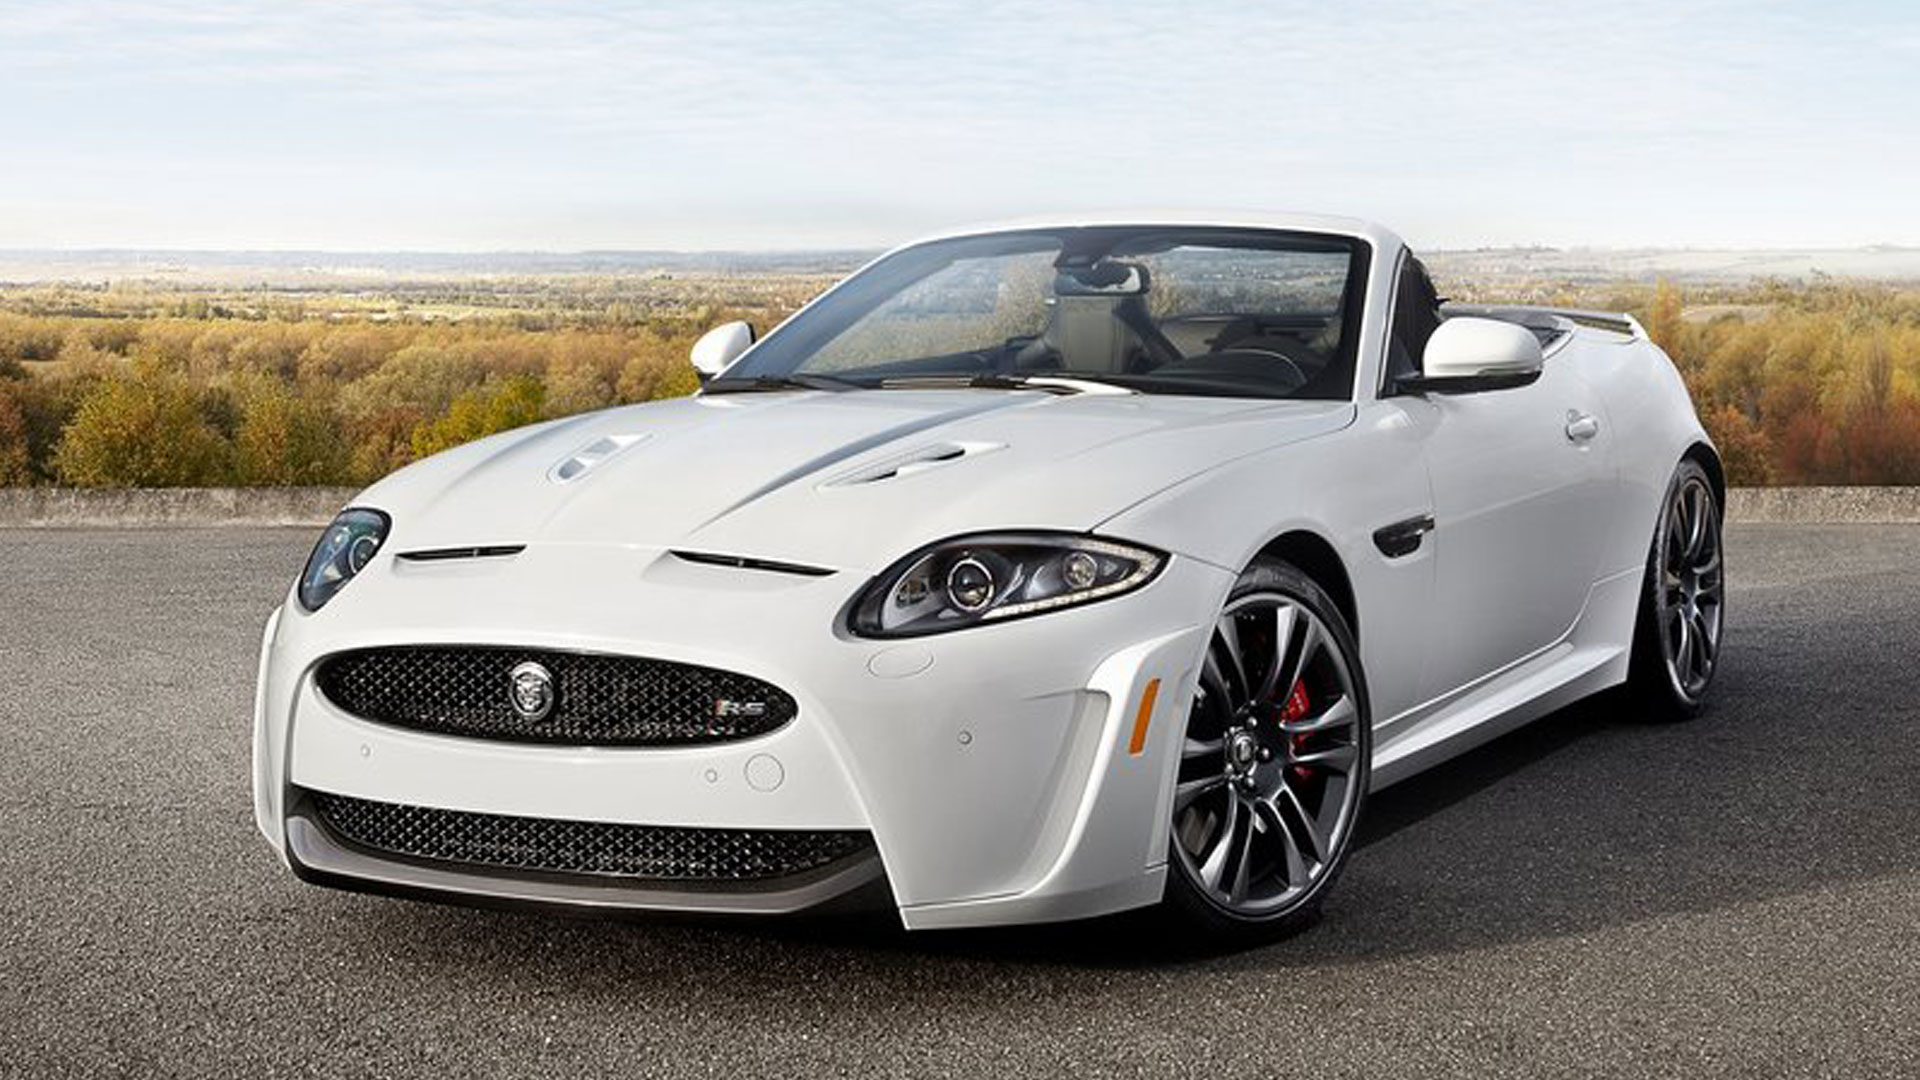 2013-Jaguar-XKR-S-Convertible-white-picture